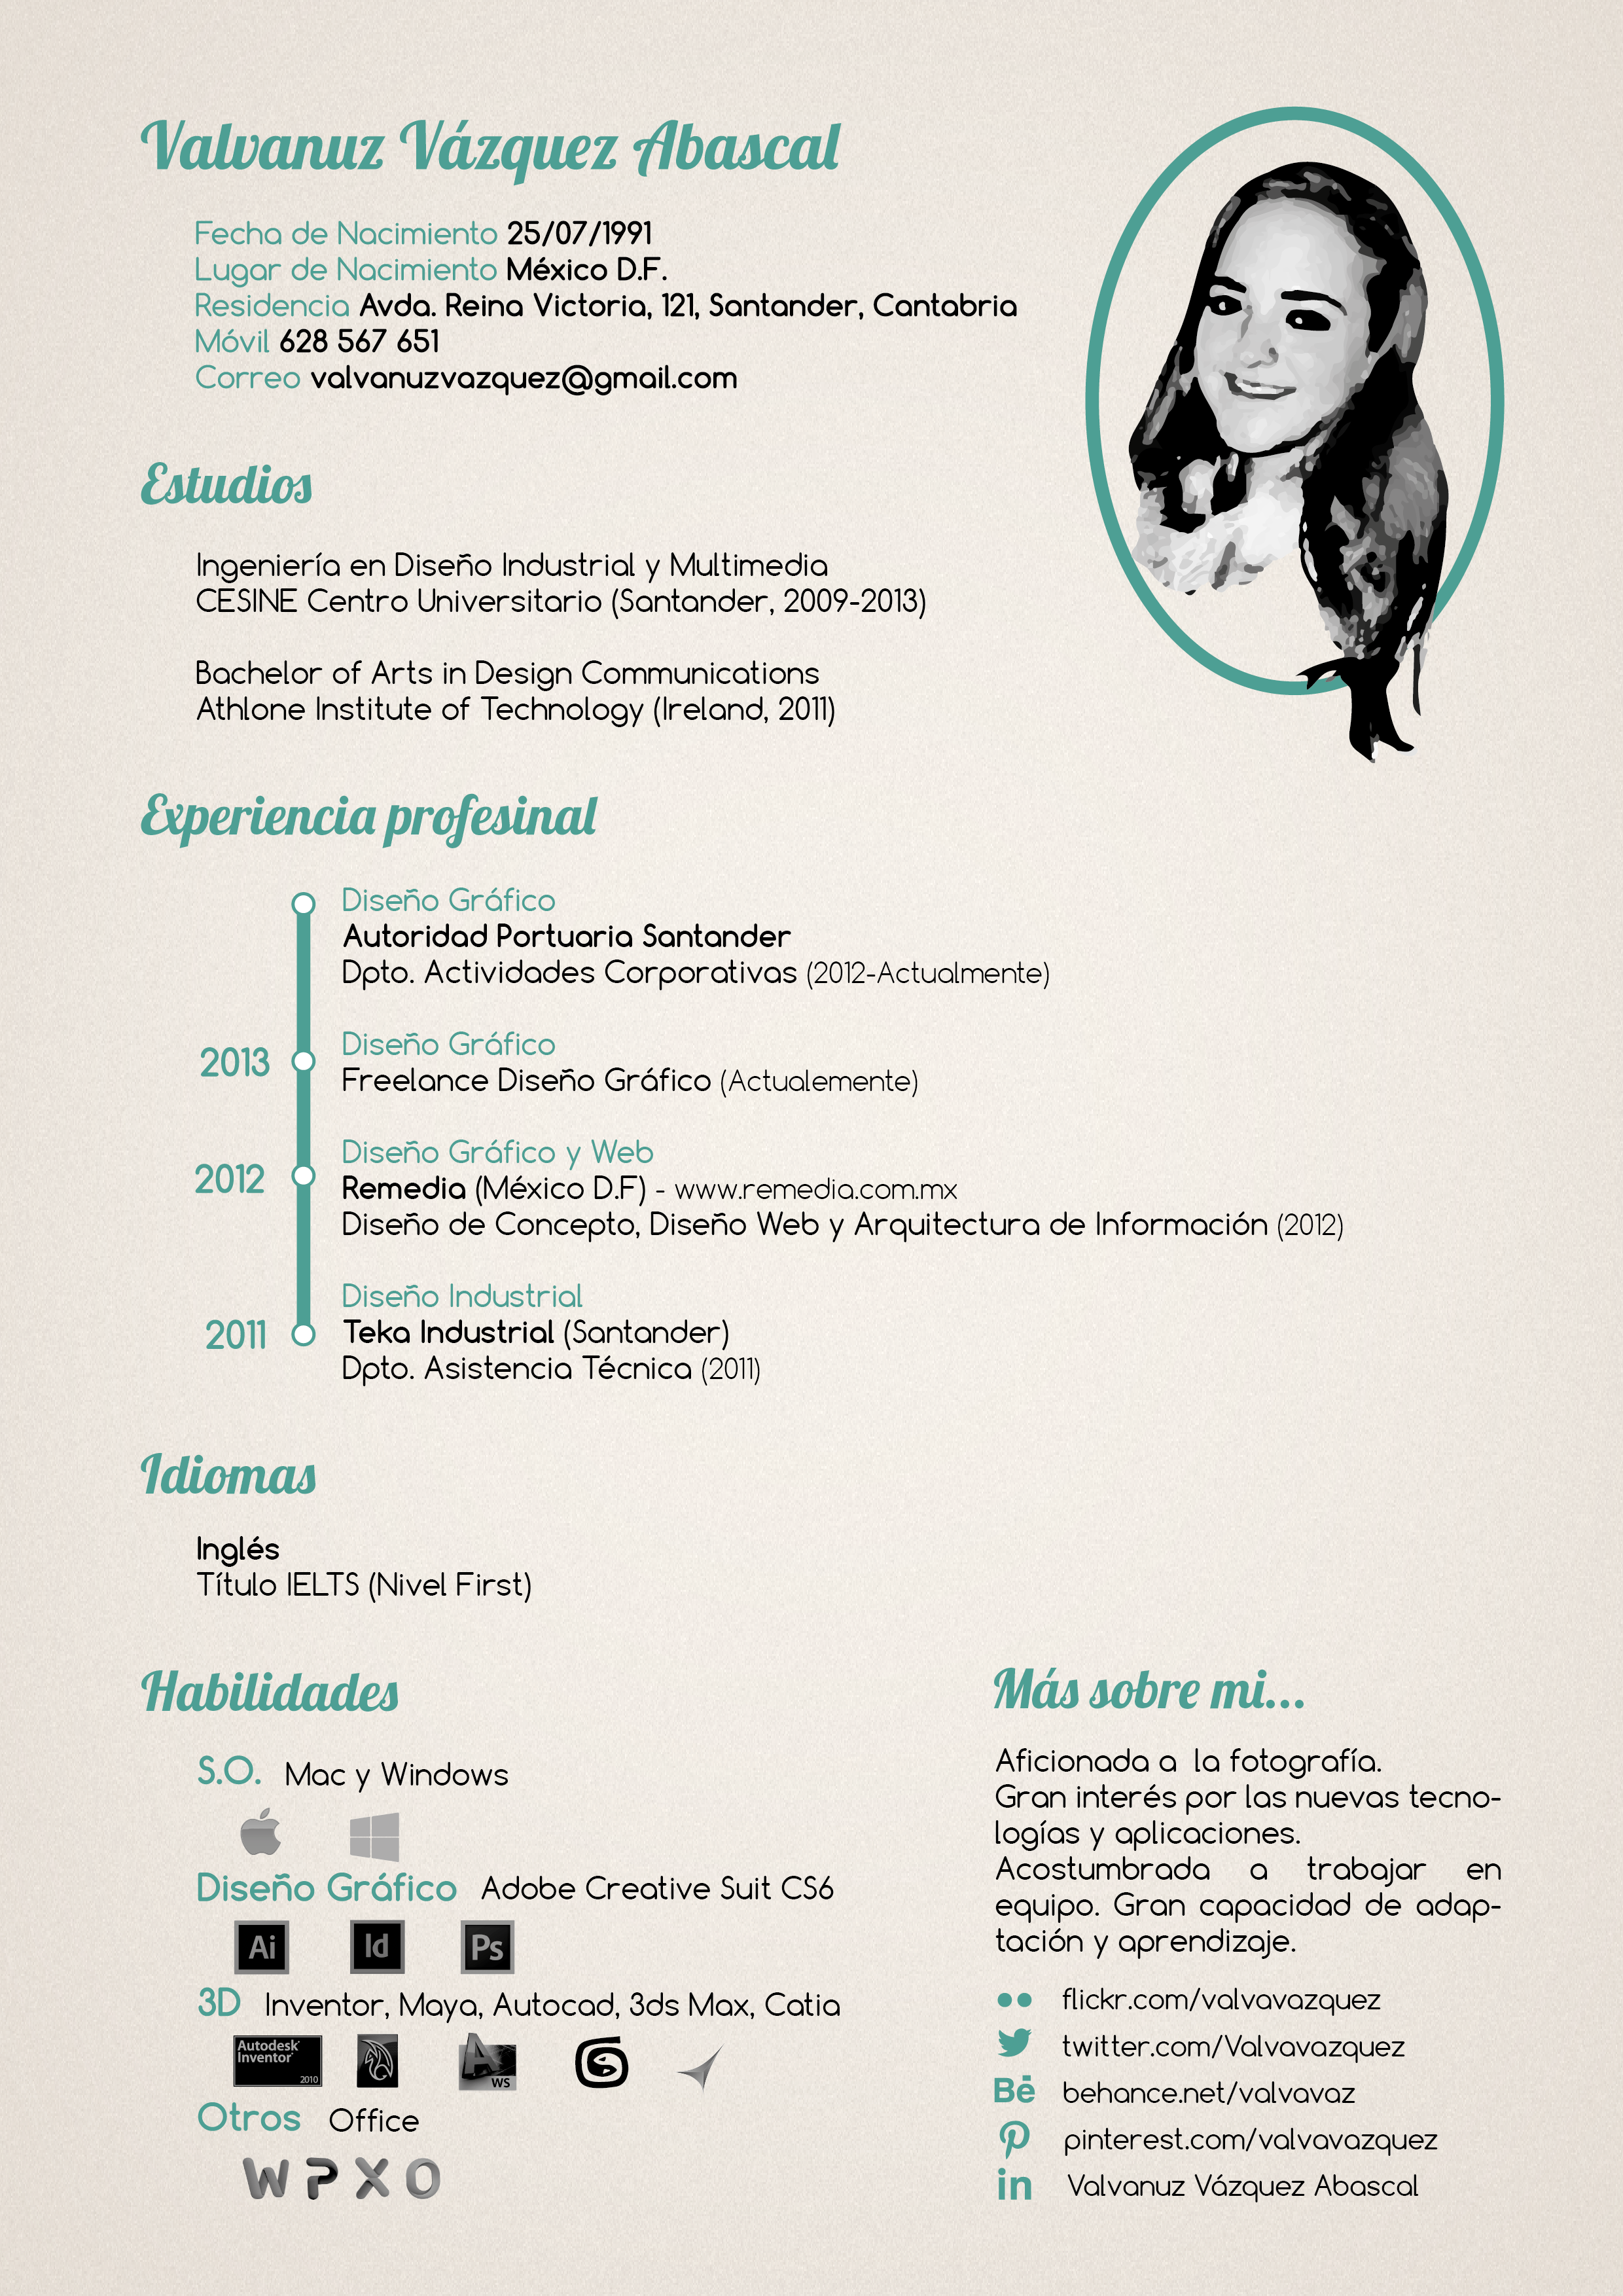 Curriculum Vitae estilo vintage | CURRICULUMS Creativos | Pinterest ...